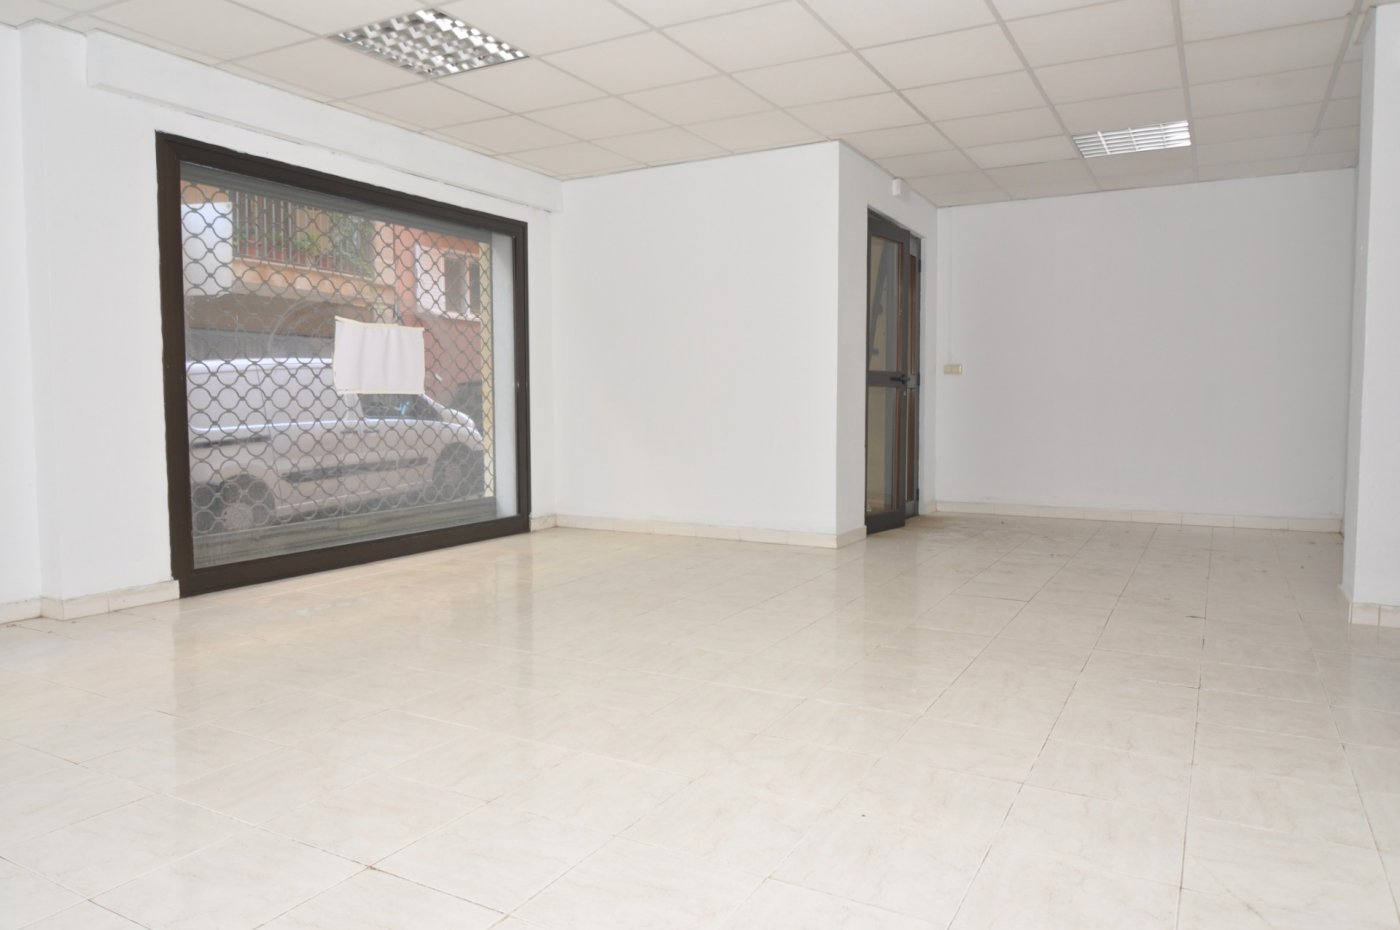 Local comercial-Venta-Andratx-204087